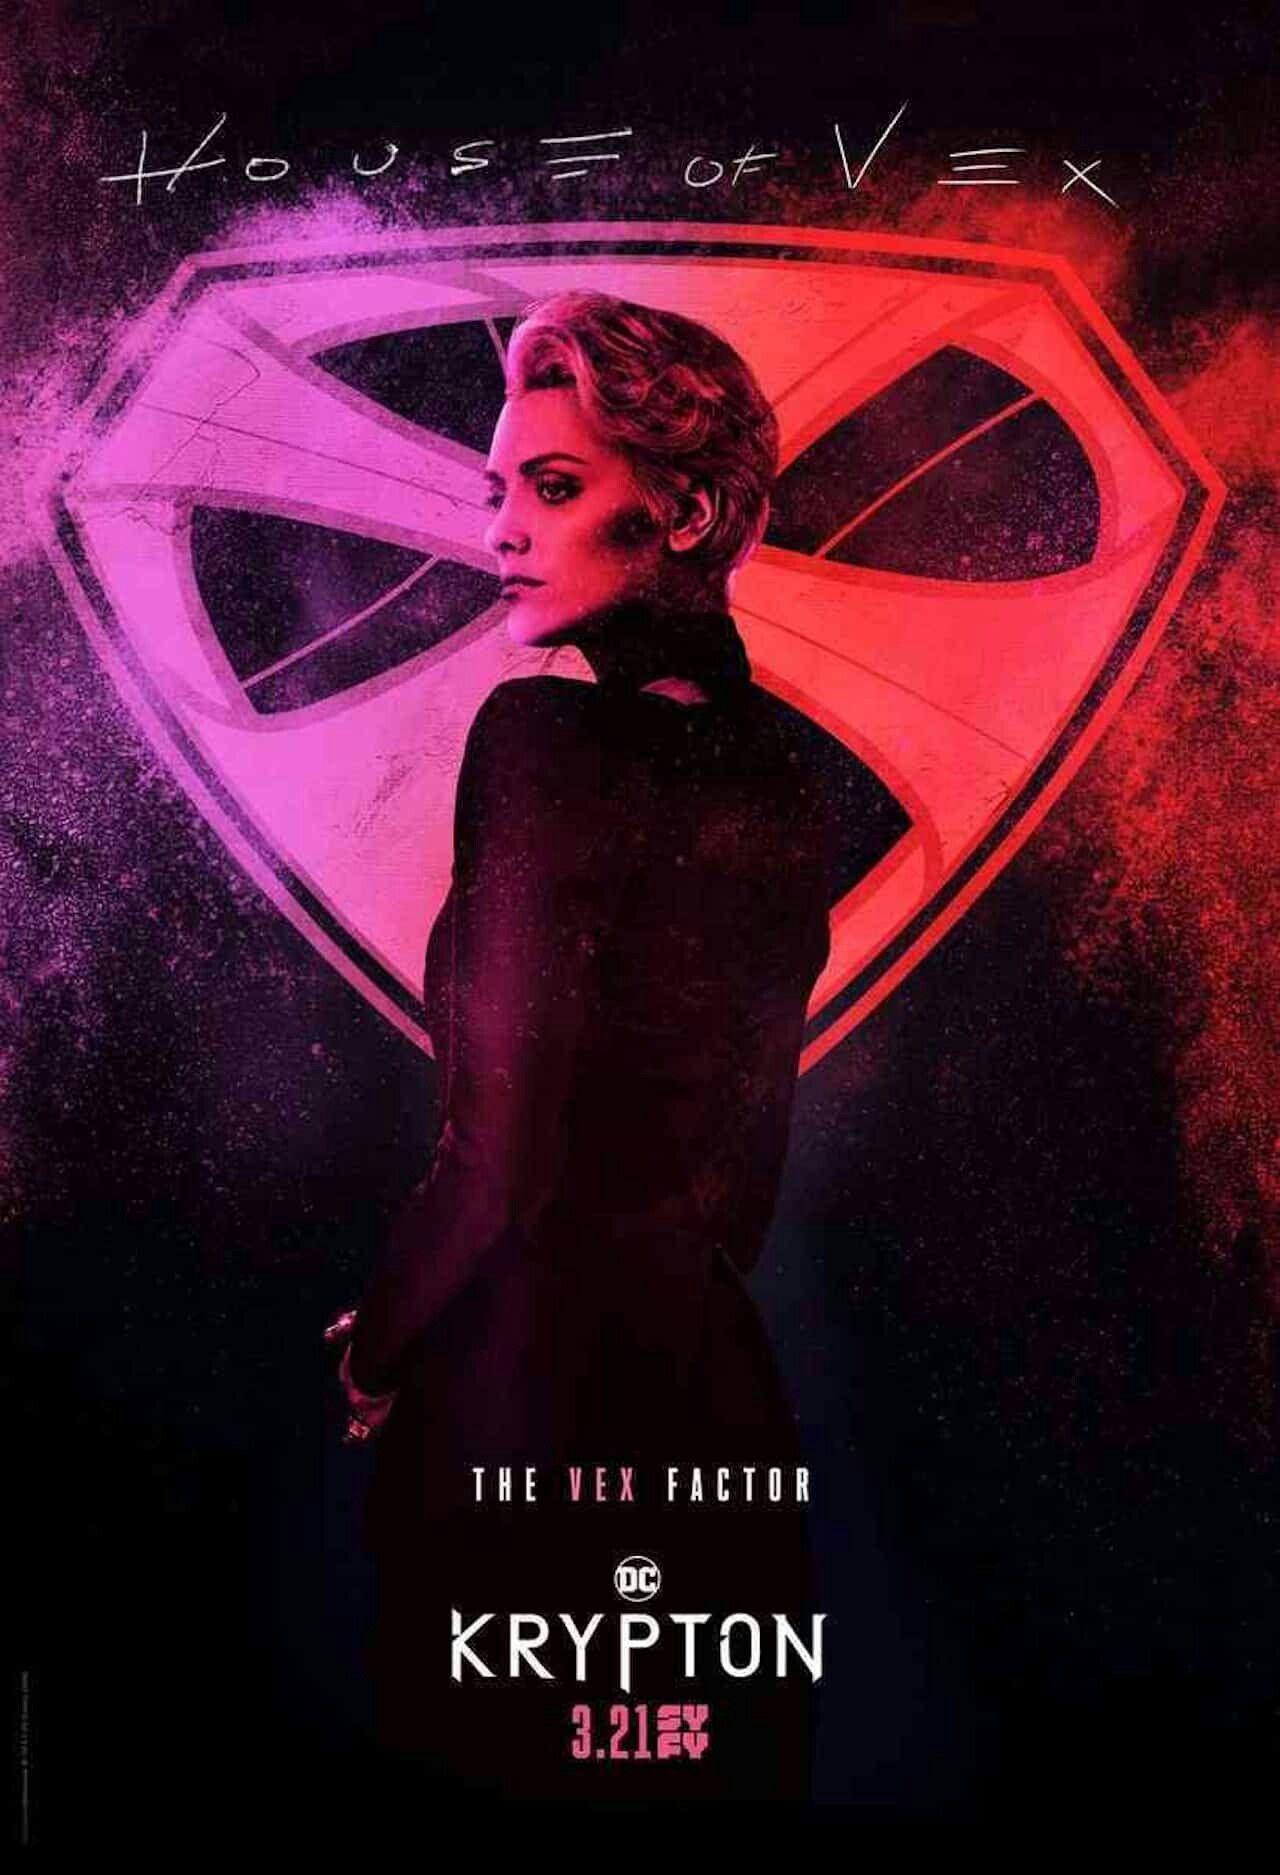 Nyssa Vex Krypton Serie Krypton Serie Poster E Marvel Comics